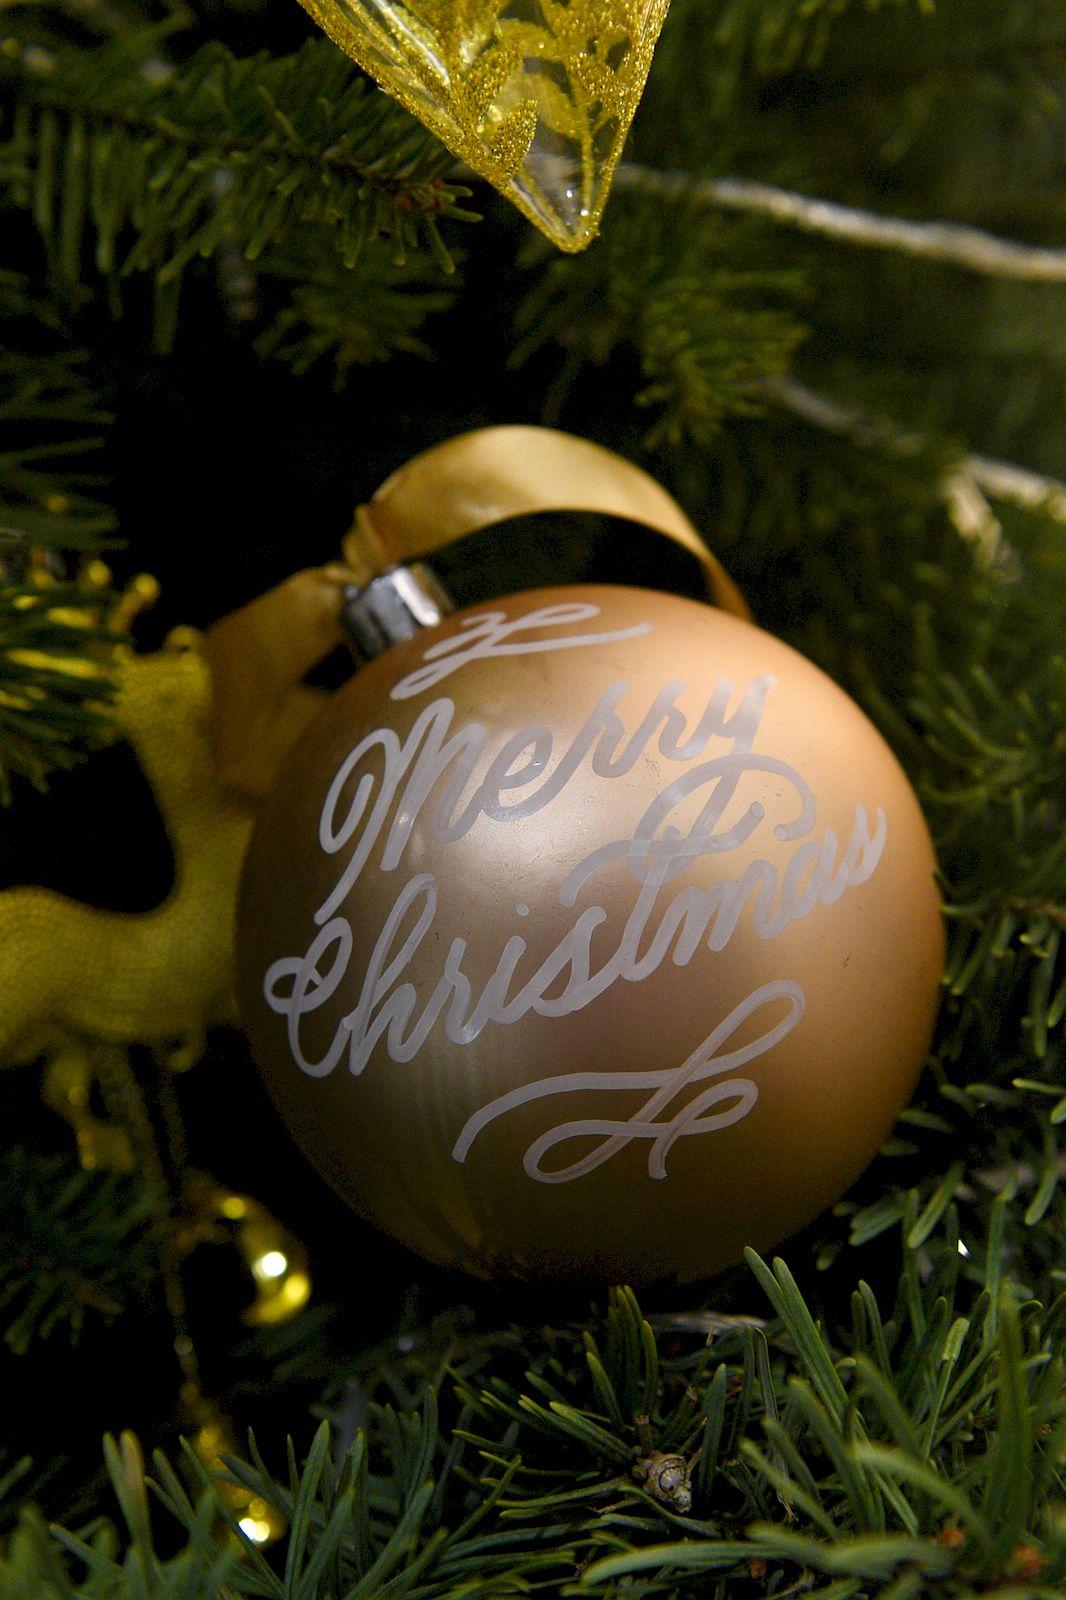 Prestige Montblanc Christmas